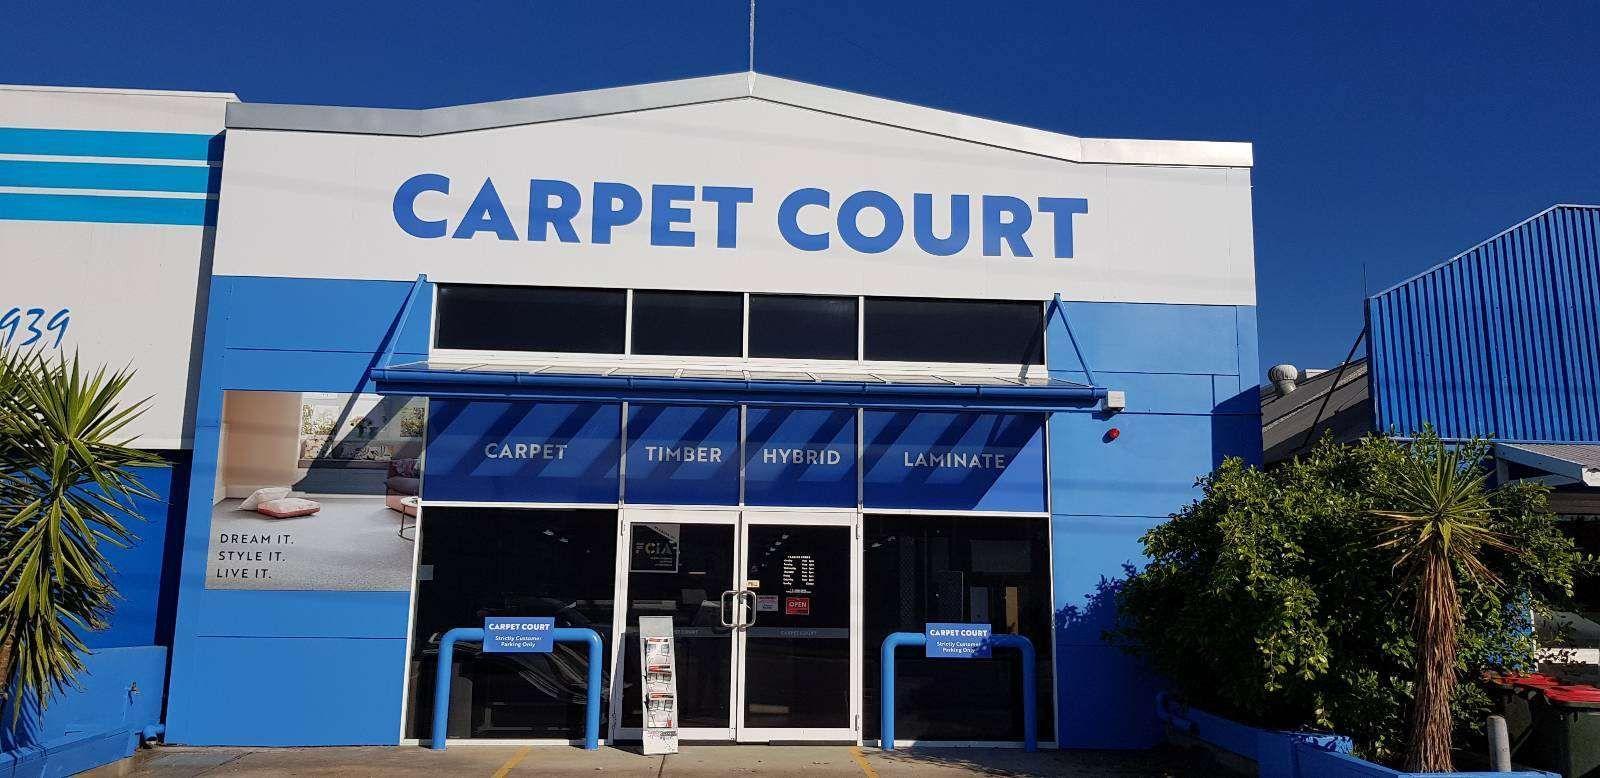 Lambton Carpet Court